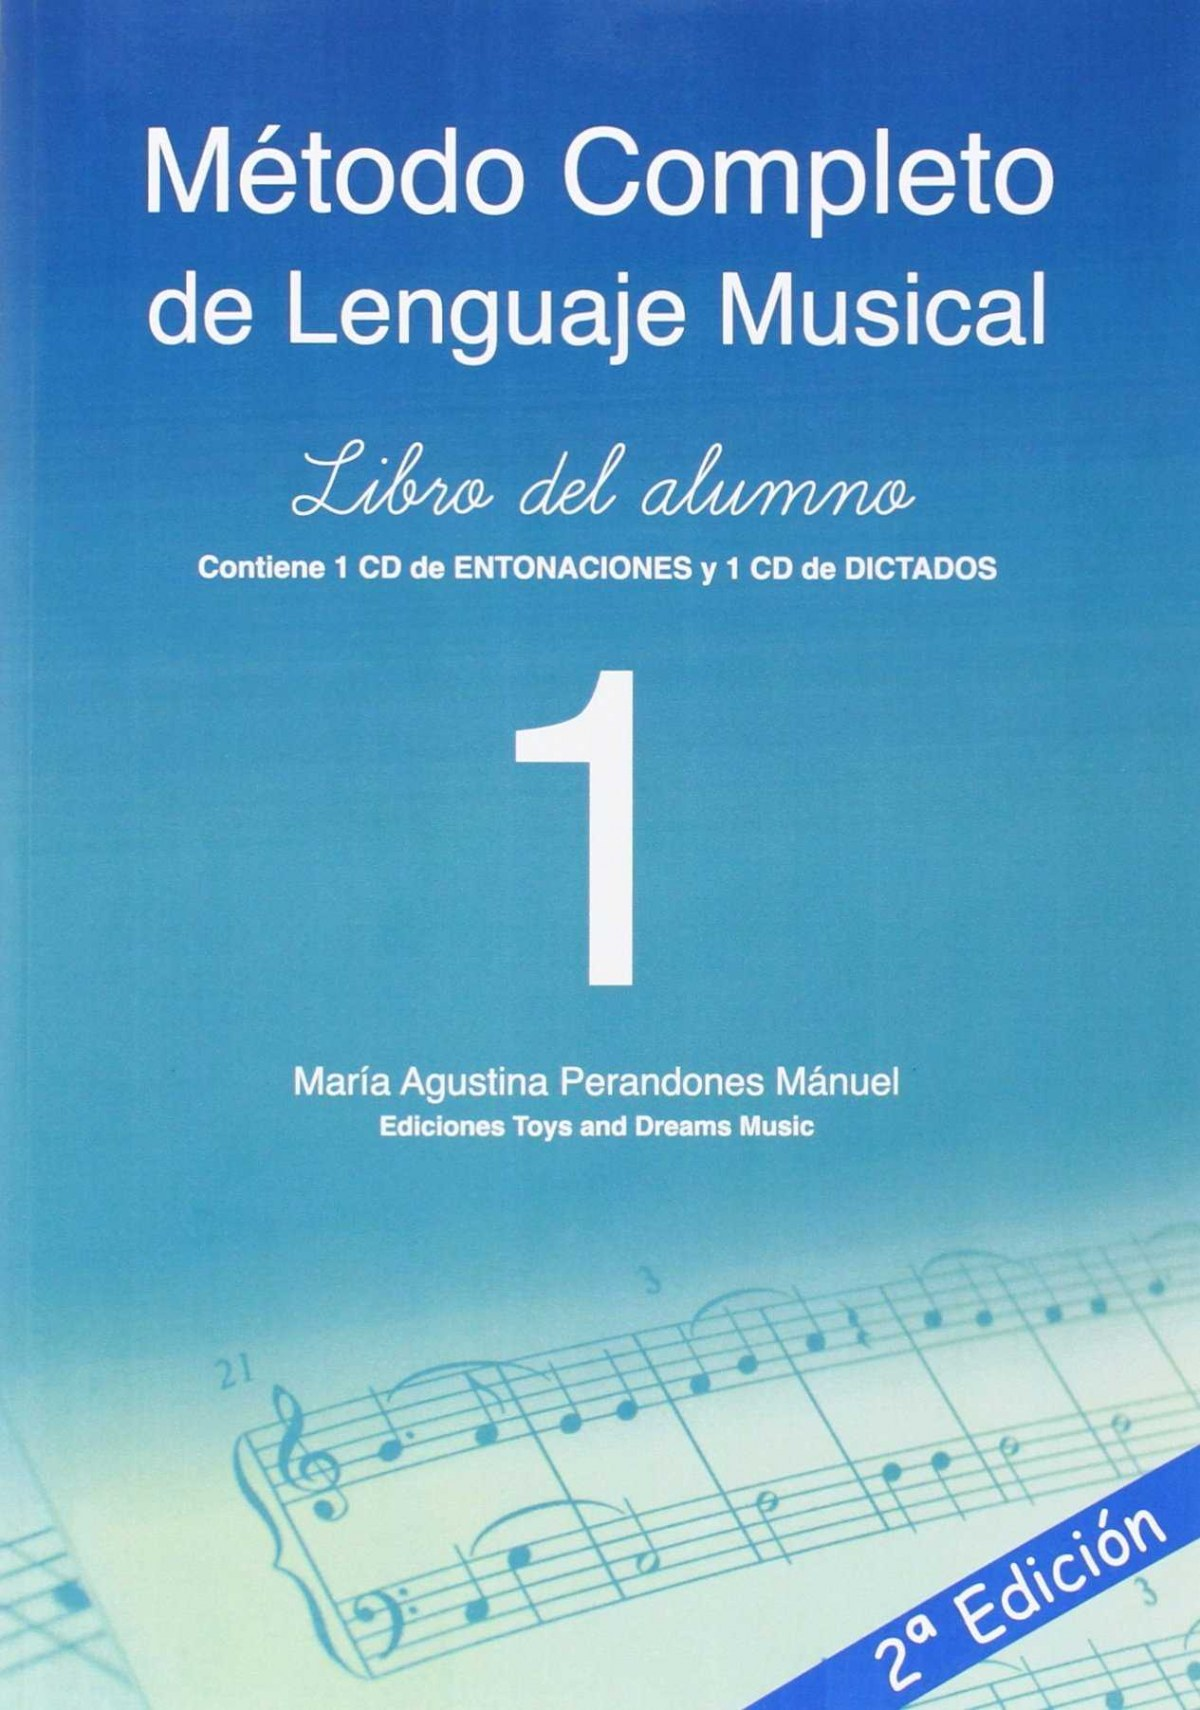 METODO COMPLETO DE LENGUAJE MUSICAL 1º NIVEL LIBRO DEL ALUMNO